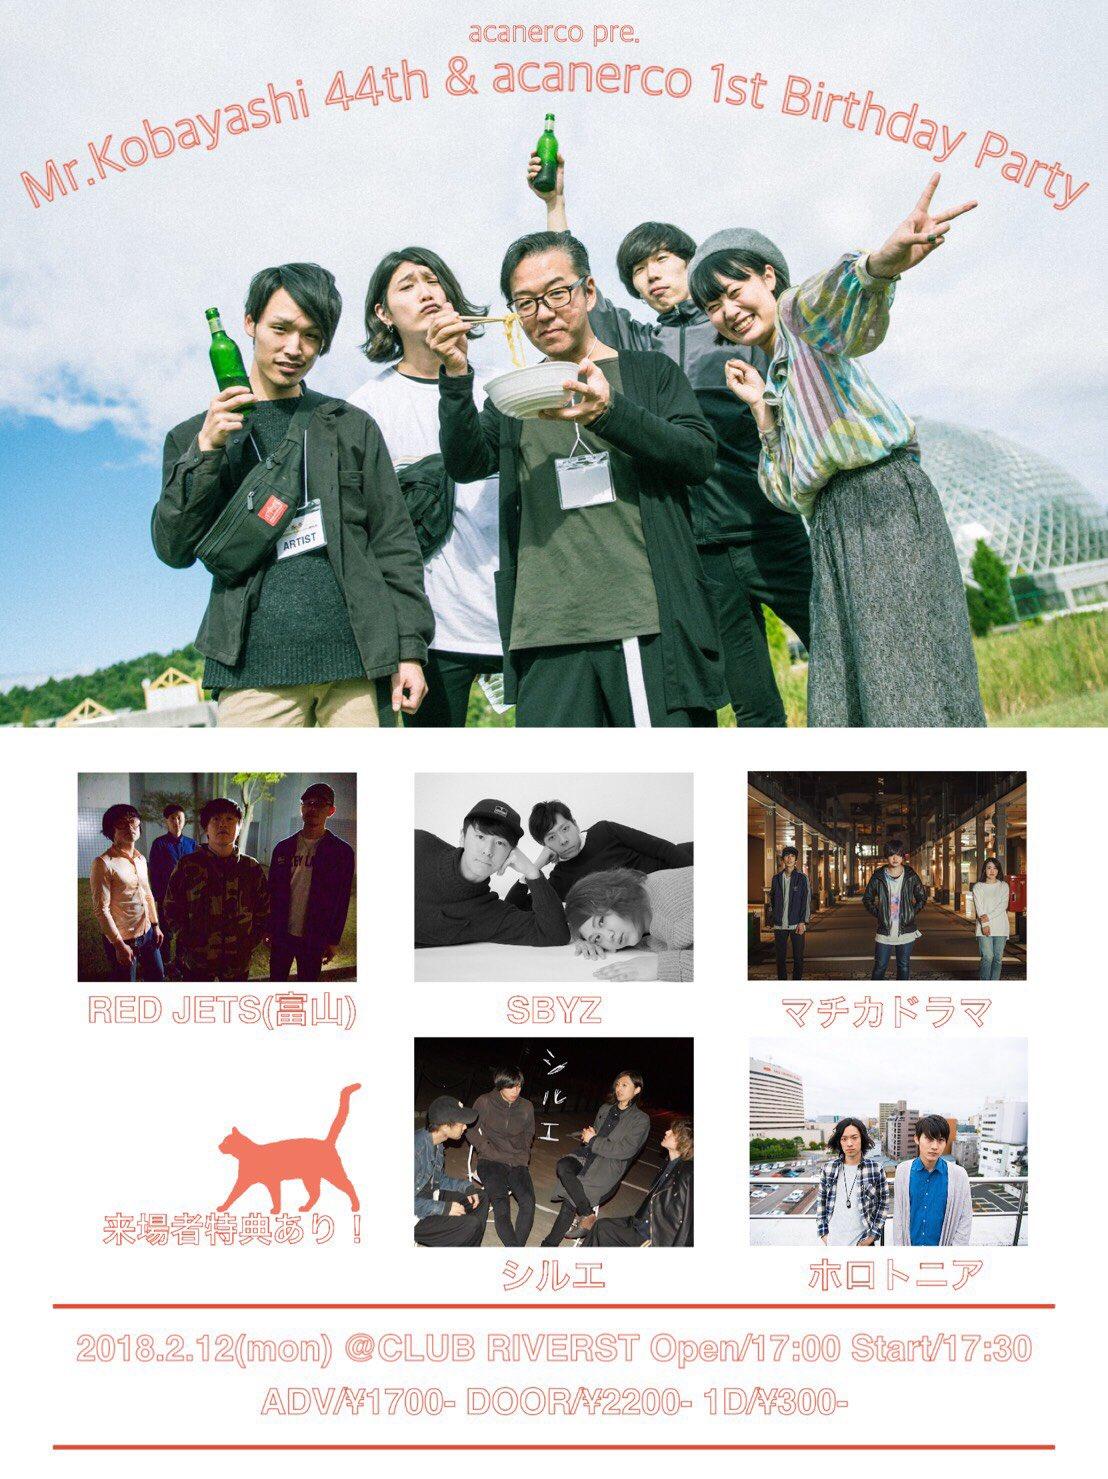 "acanerco pre. ""Mr. Kobayashi 44th & acanerco 1st Birthday Party"""